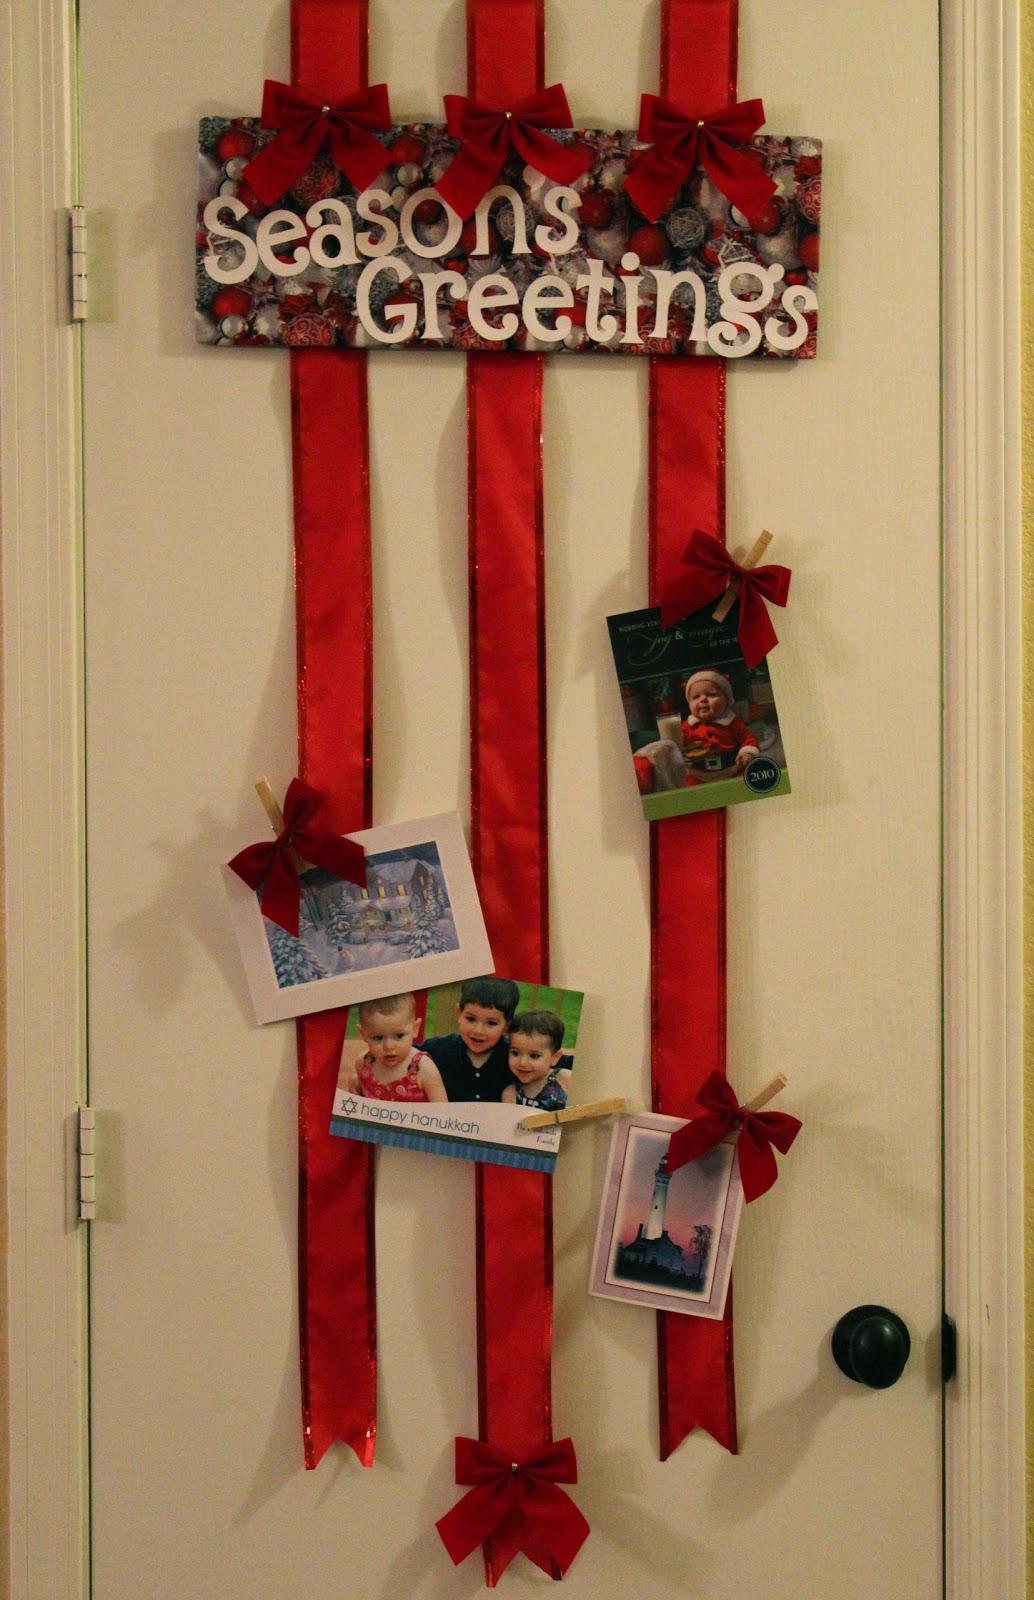 Ribbon christmas card holder - Christmas card display ideas ...